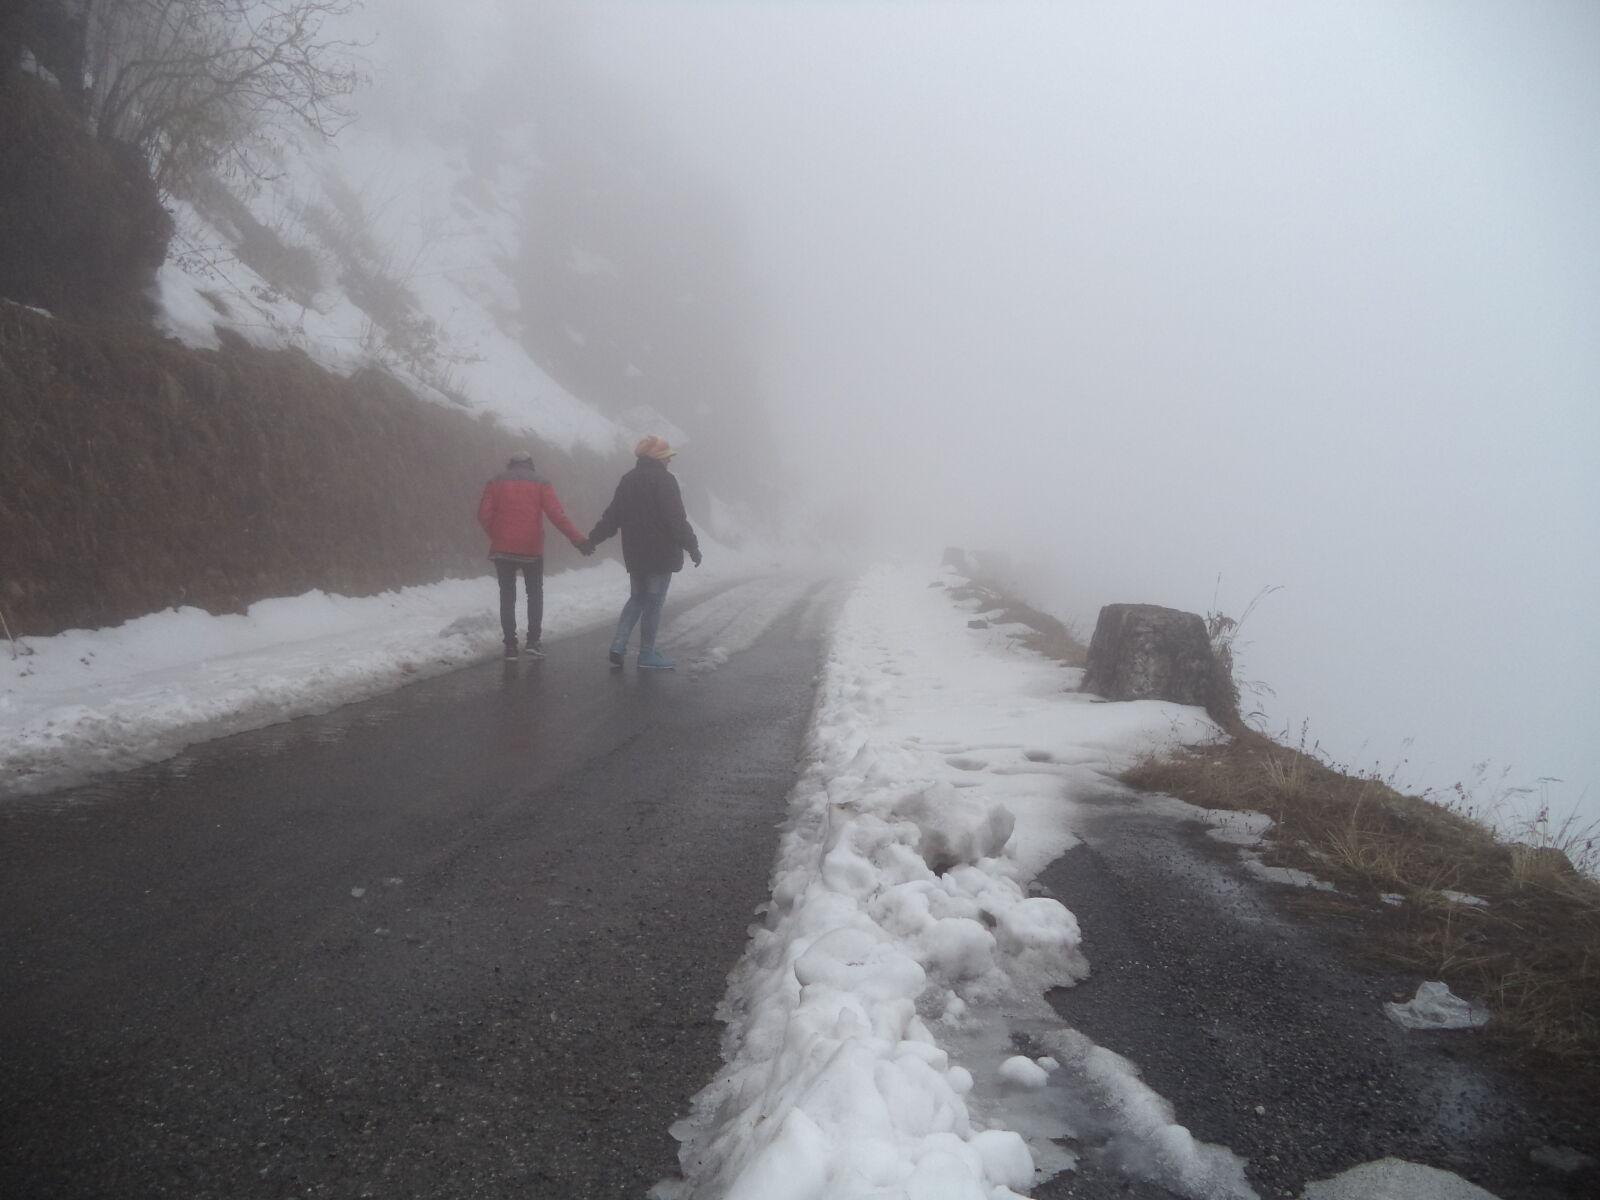 foggy, sn, sno